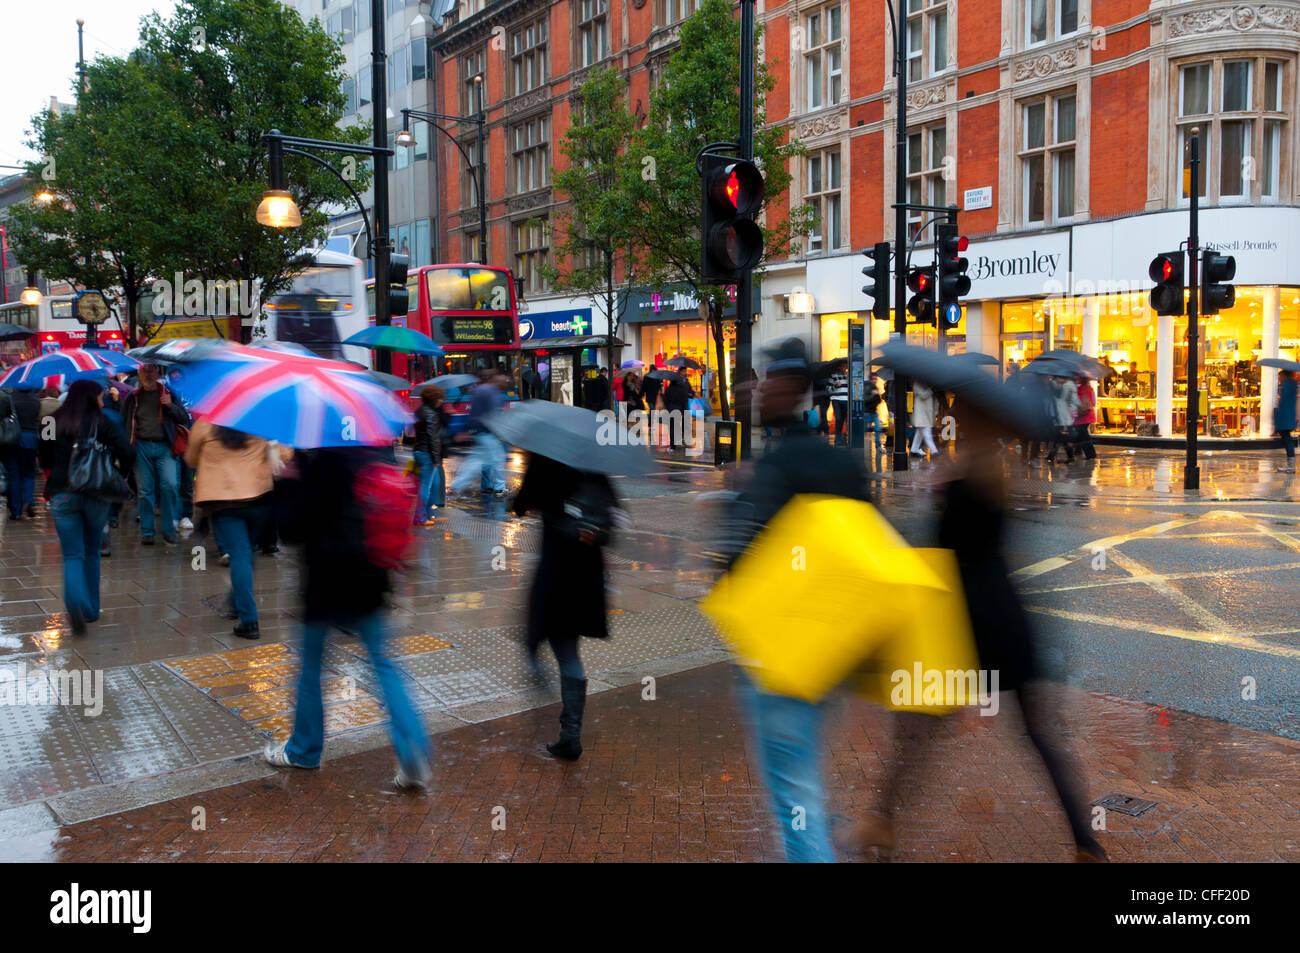 Shoppers in the rain, Oxford Street, London, England, United Kingdom, Europe - Stock Image